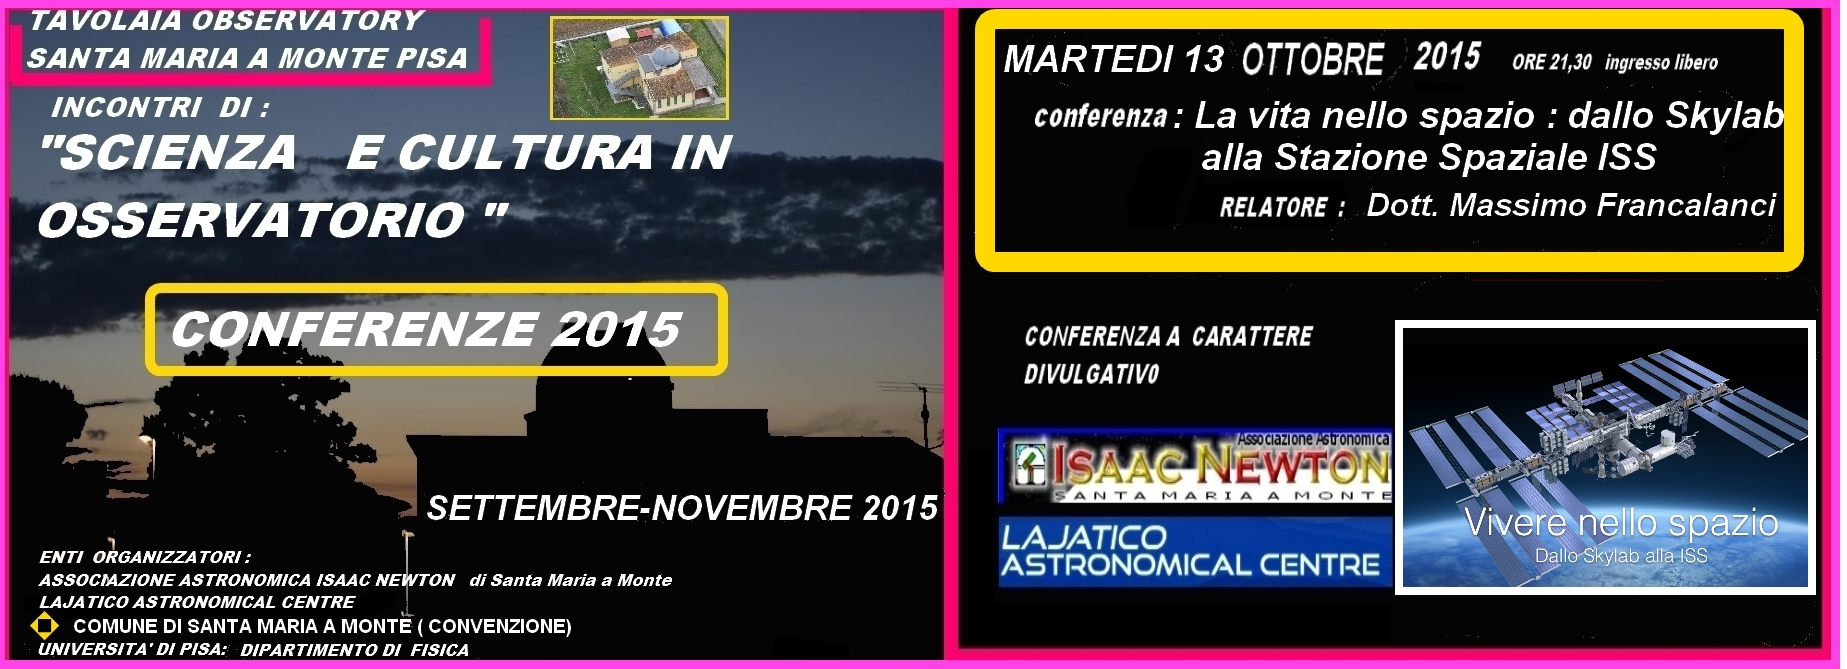 locandina_Facebook_ FRANCALANCI _13_0TTOBRE